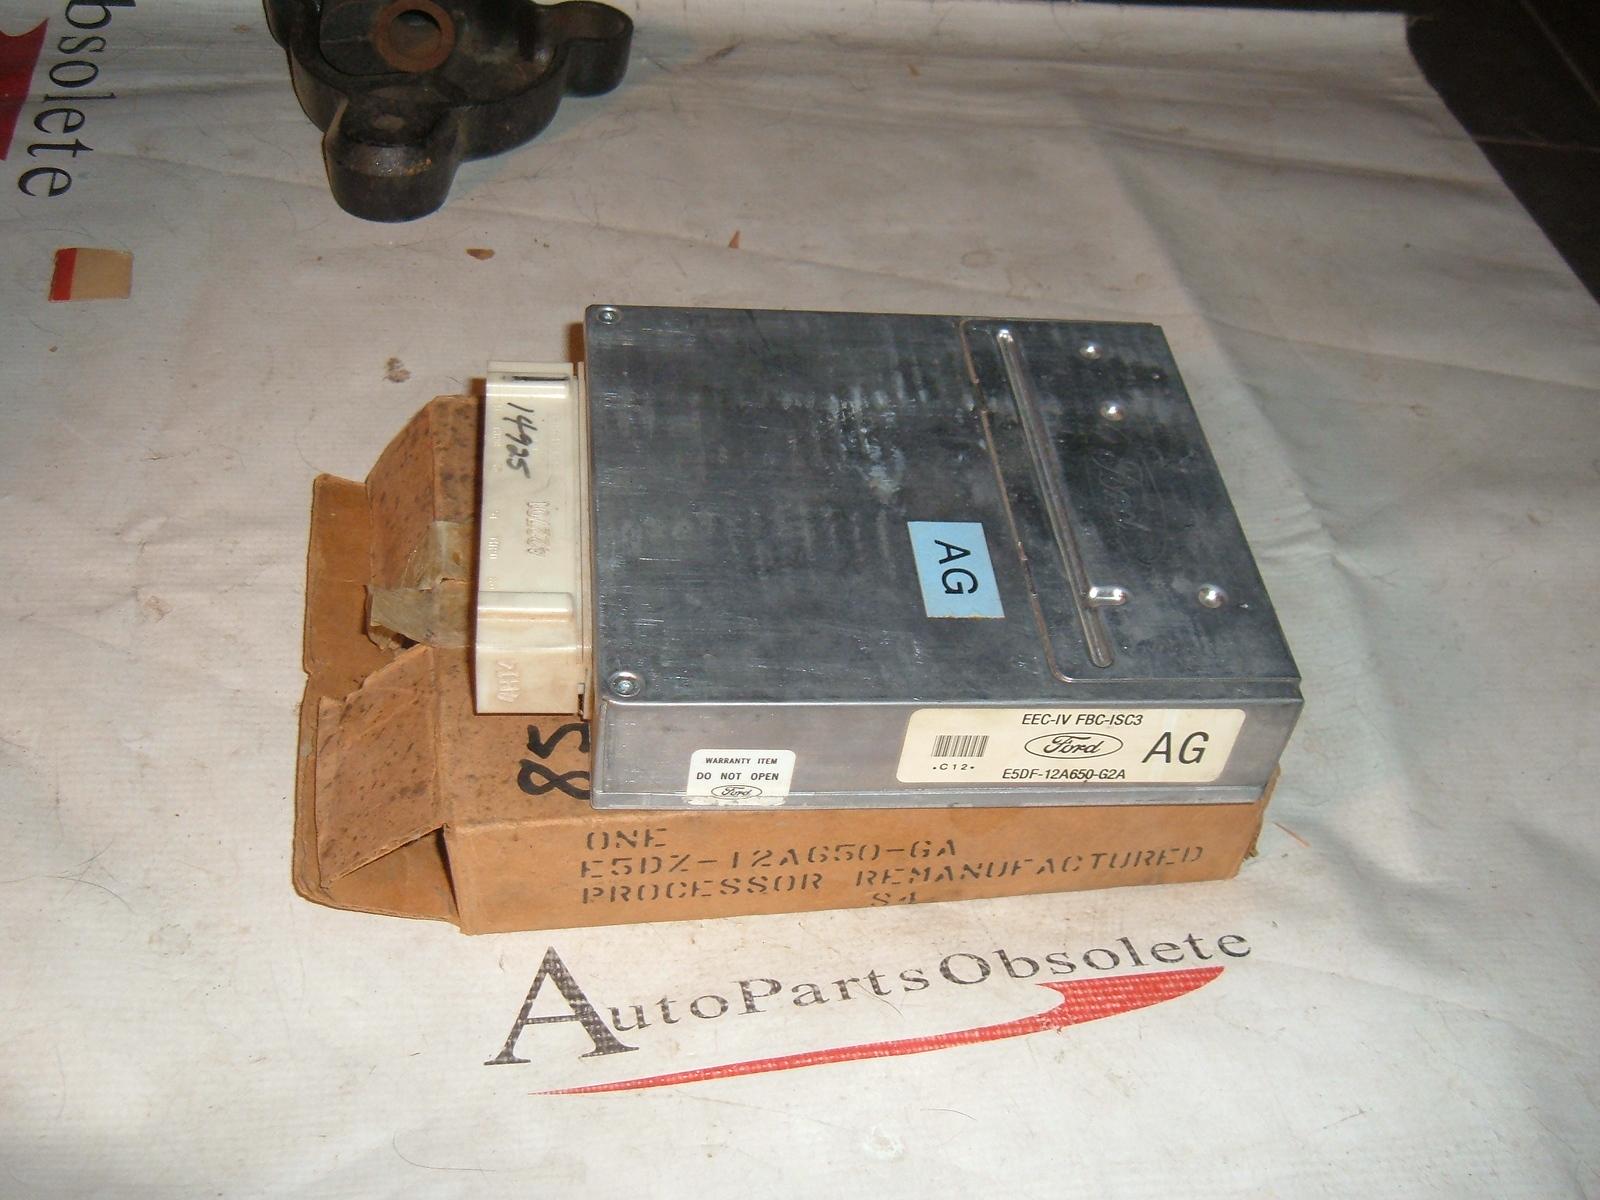 1985 ford truck engine control module E5DZ-12A650-GA (z e5dz12a650ga)